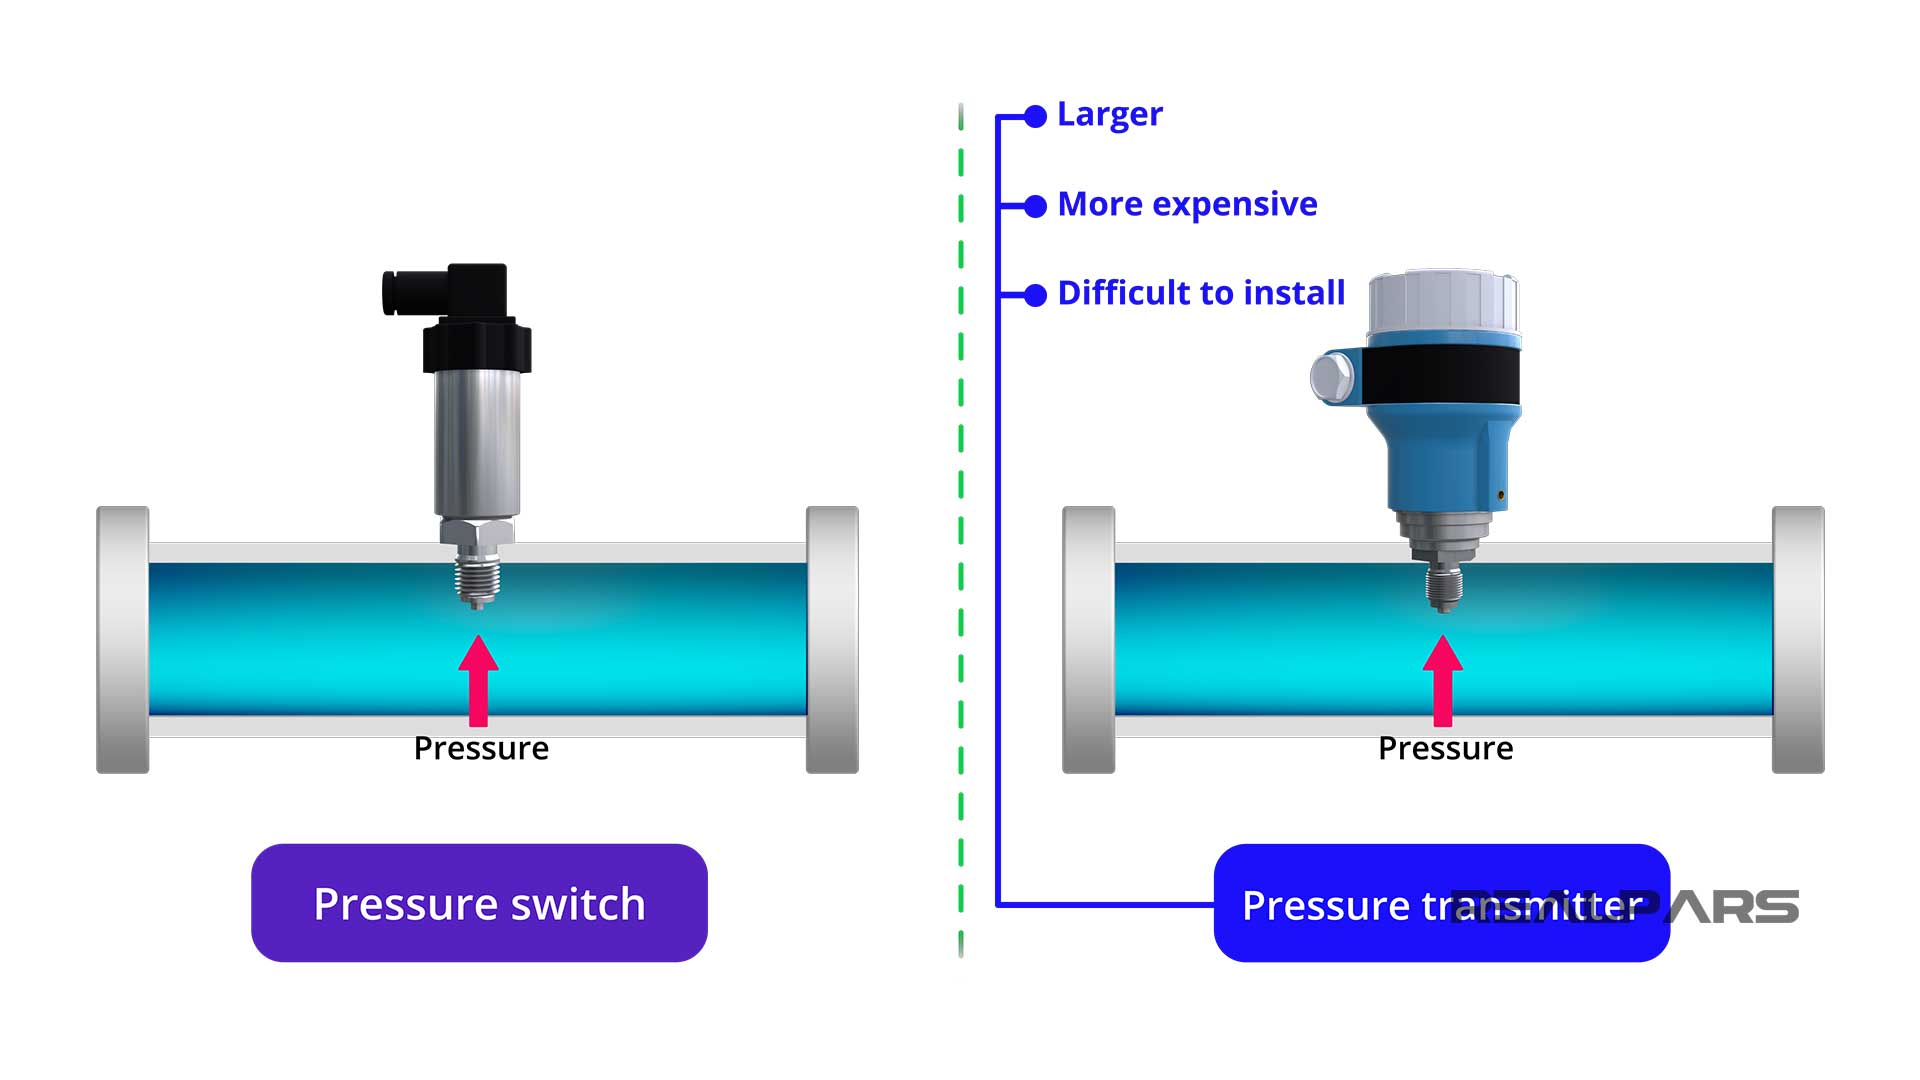 Pressure-switch-vs-pressure-transmitter